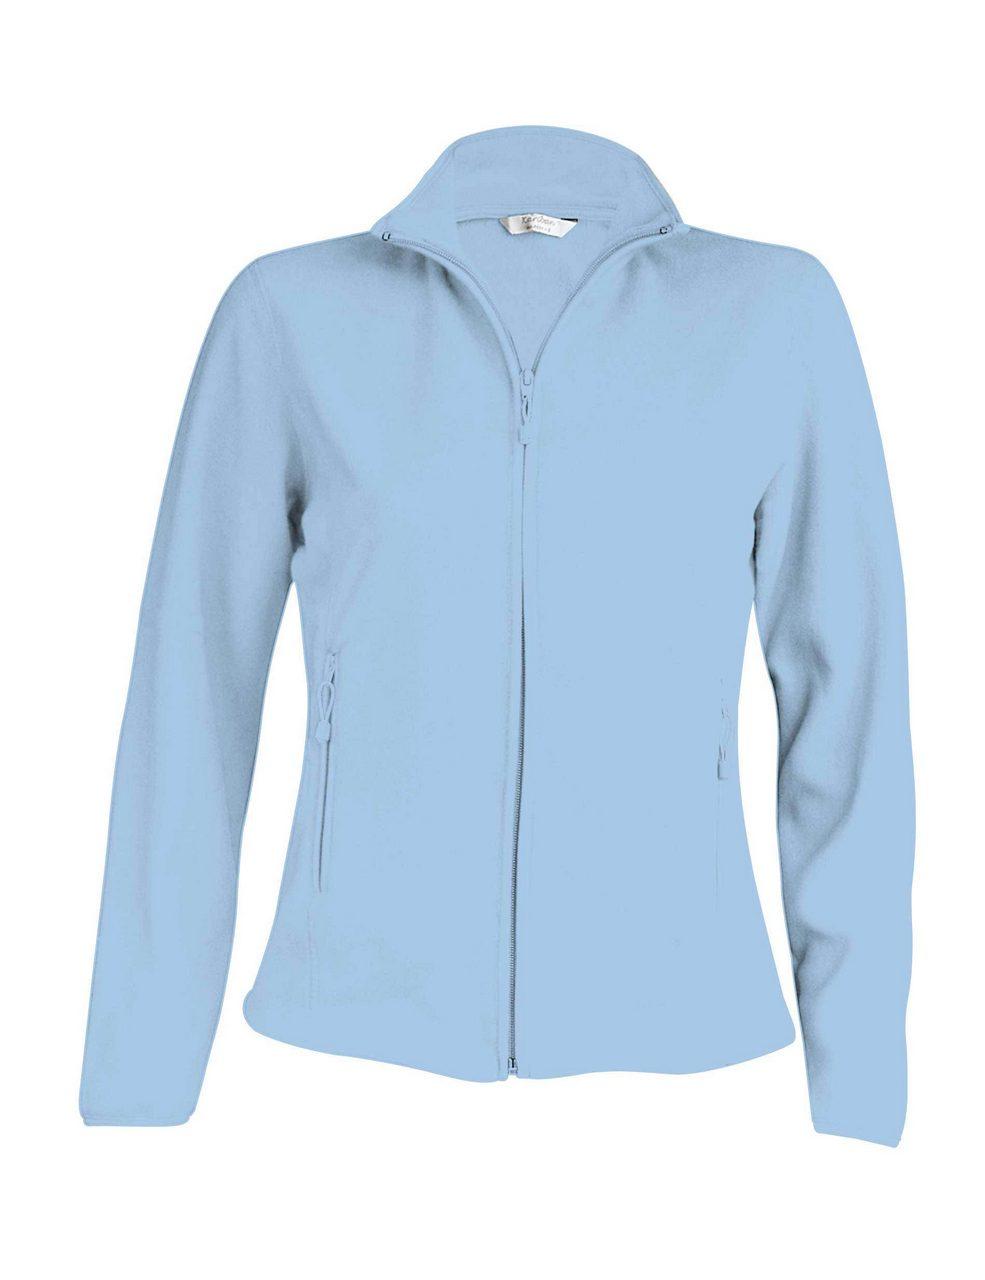 Fleece KA907 sky blue Veste jachete dama barbatesti polar fleece softshell fas gluga ploaie vant broderie serigrafie termotransfer   Toroadv.ro